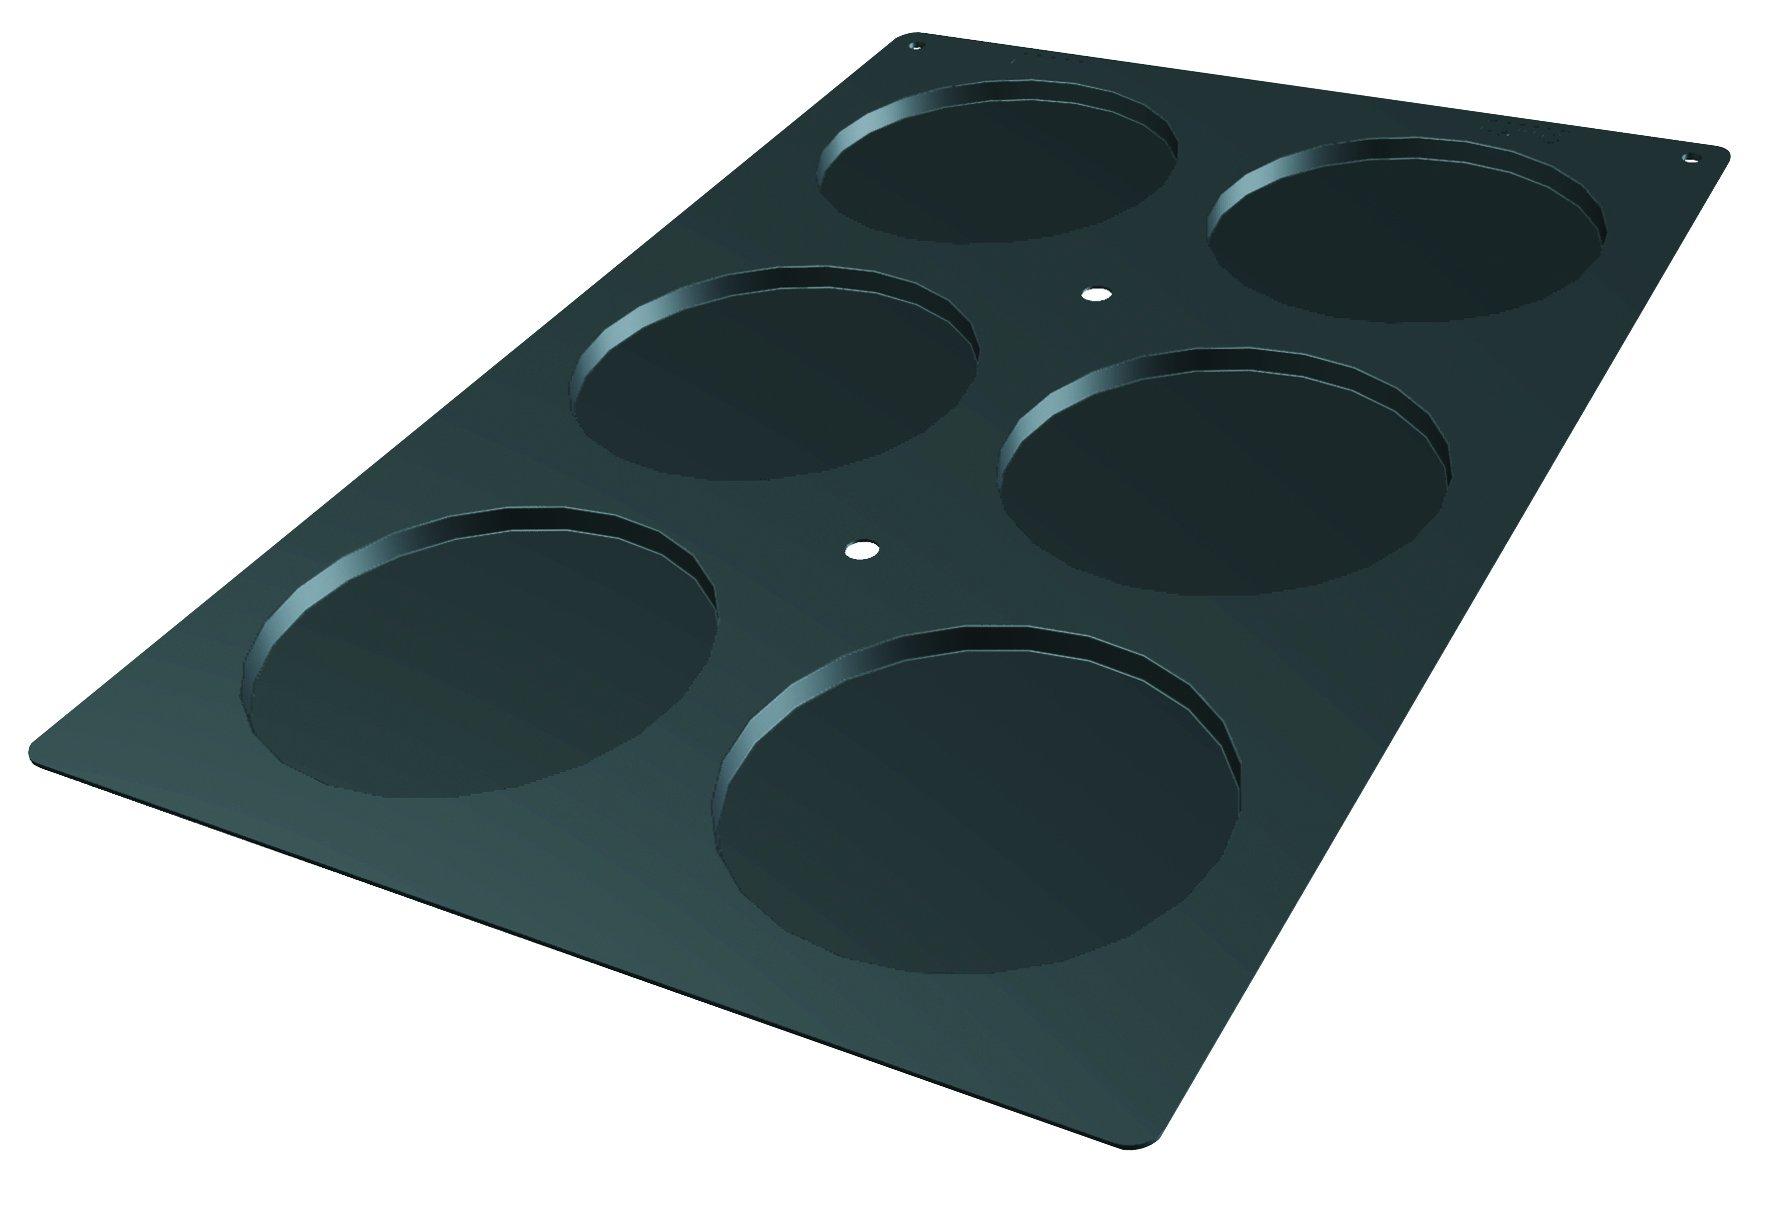 Lekue Professional Baking 6 Cavities Disc Mold, 23.6'' x 15.7'', Black